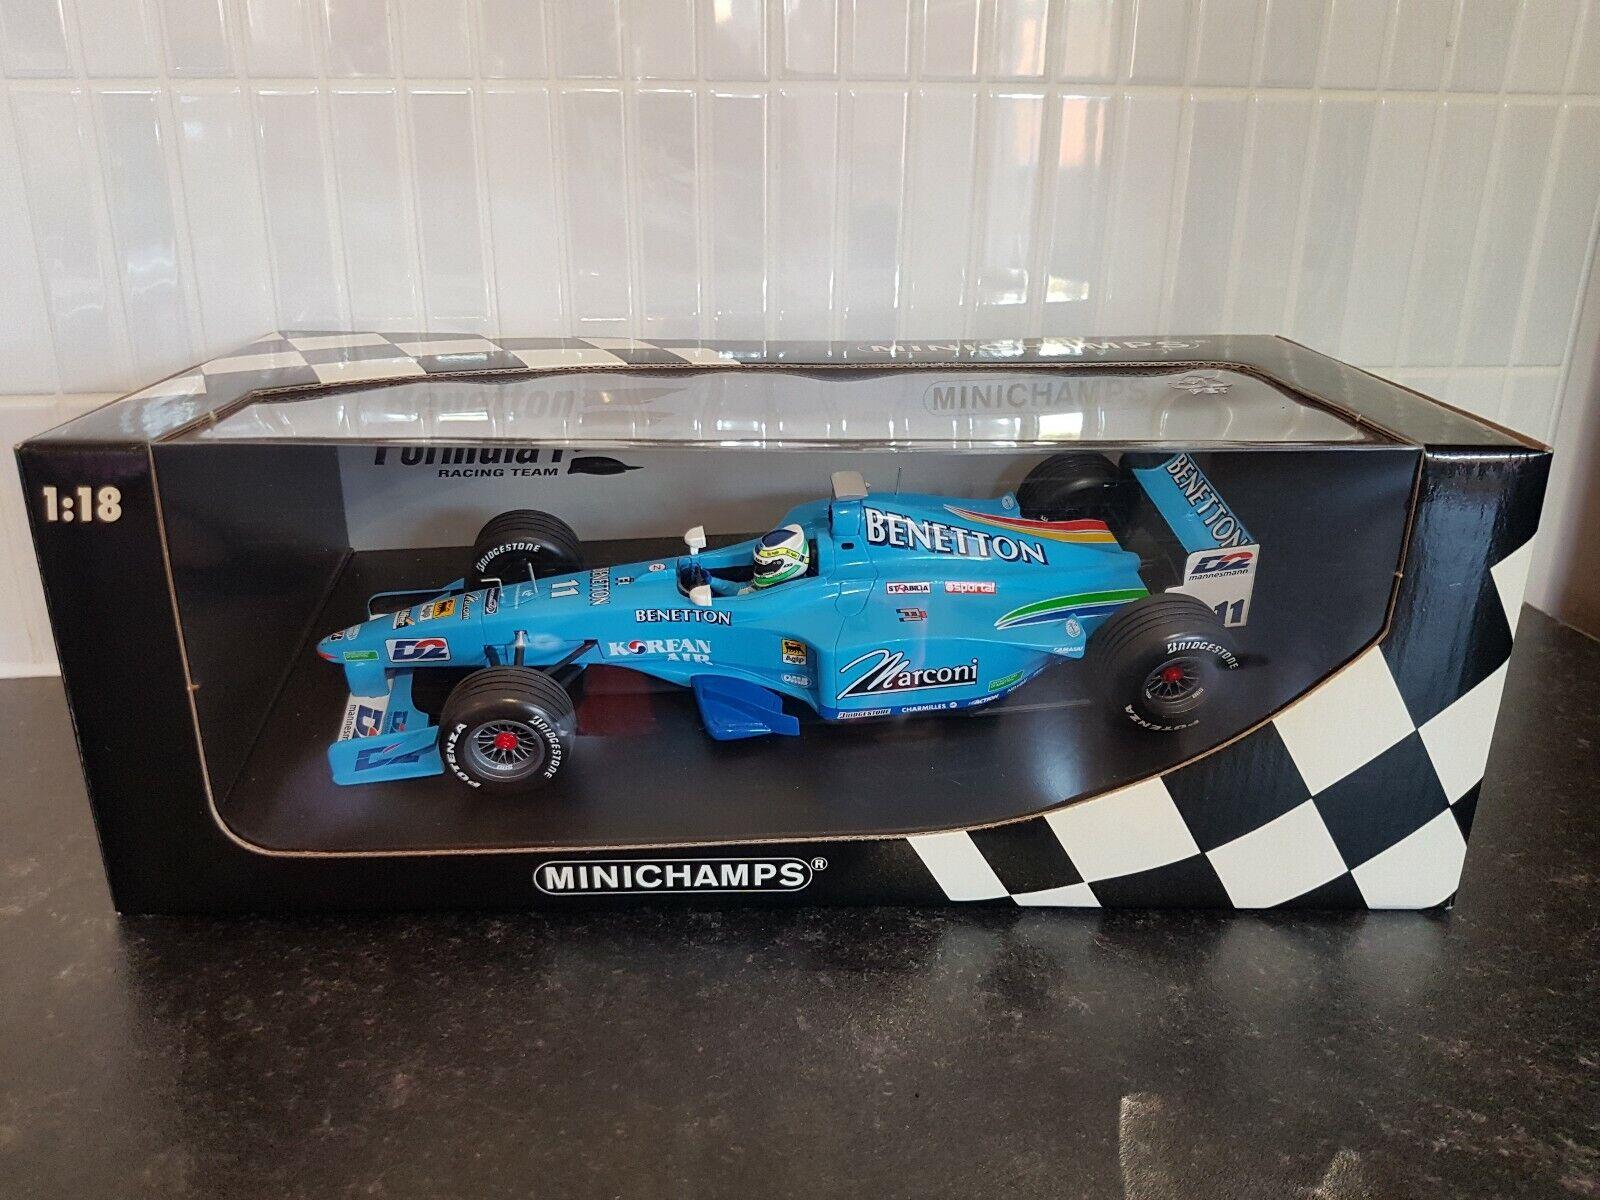 Minichamps 1 18 F1 Benetton Playlife Showcar 2000 G. Fisichella Great Condition